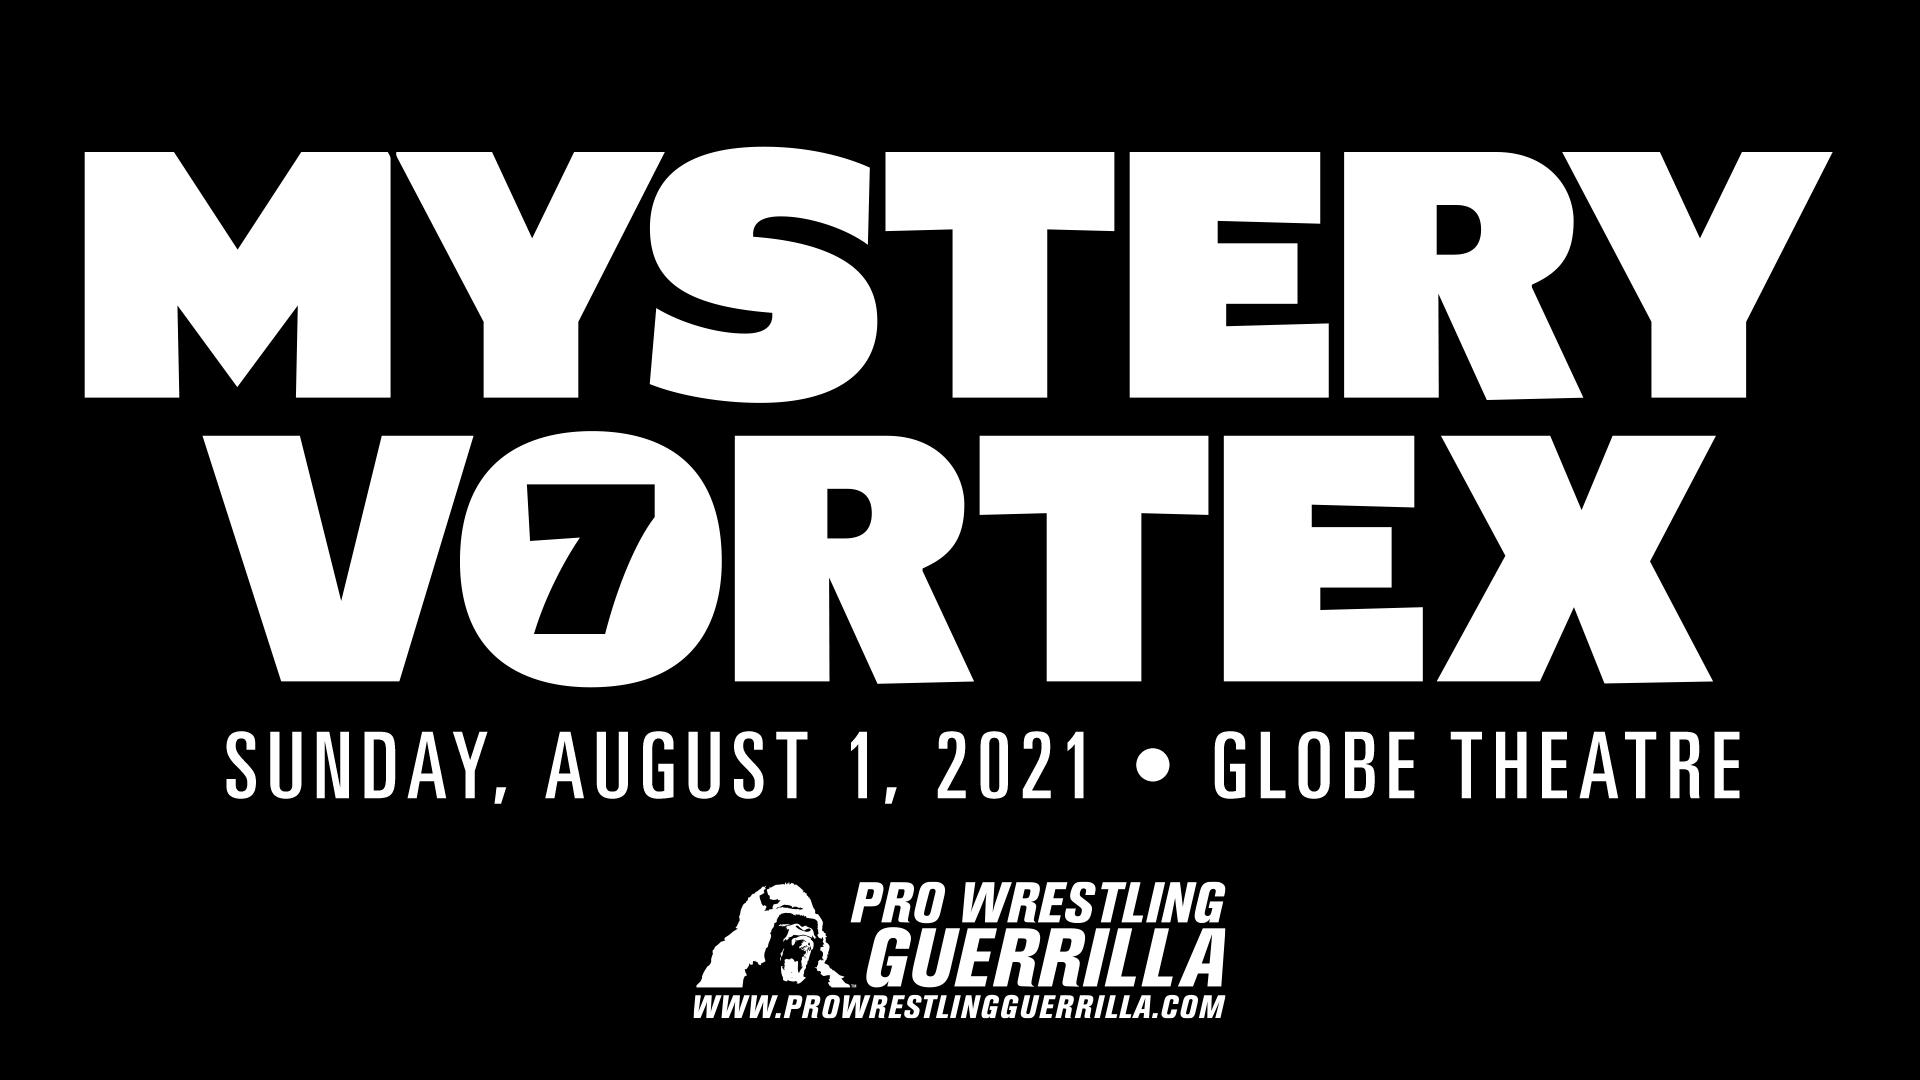 pwg mystery vortex 7